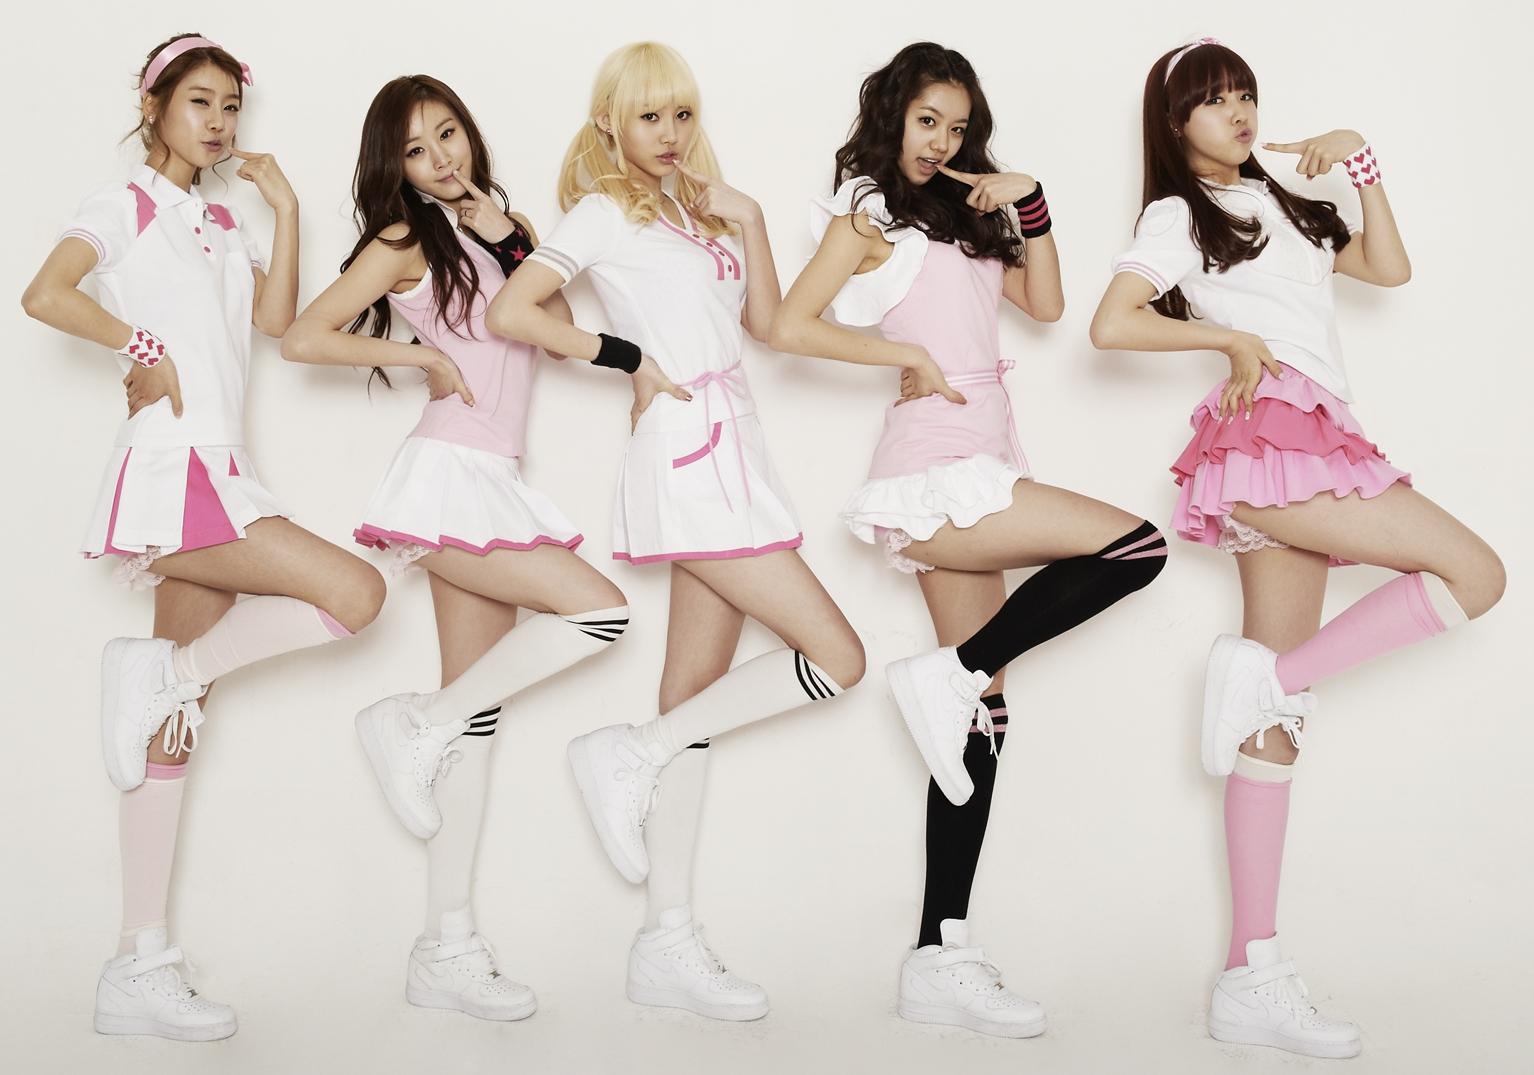 Korean high school Uniforms - TheFastFashion.com